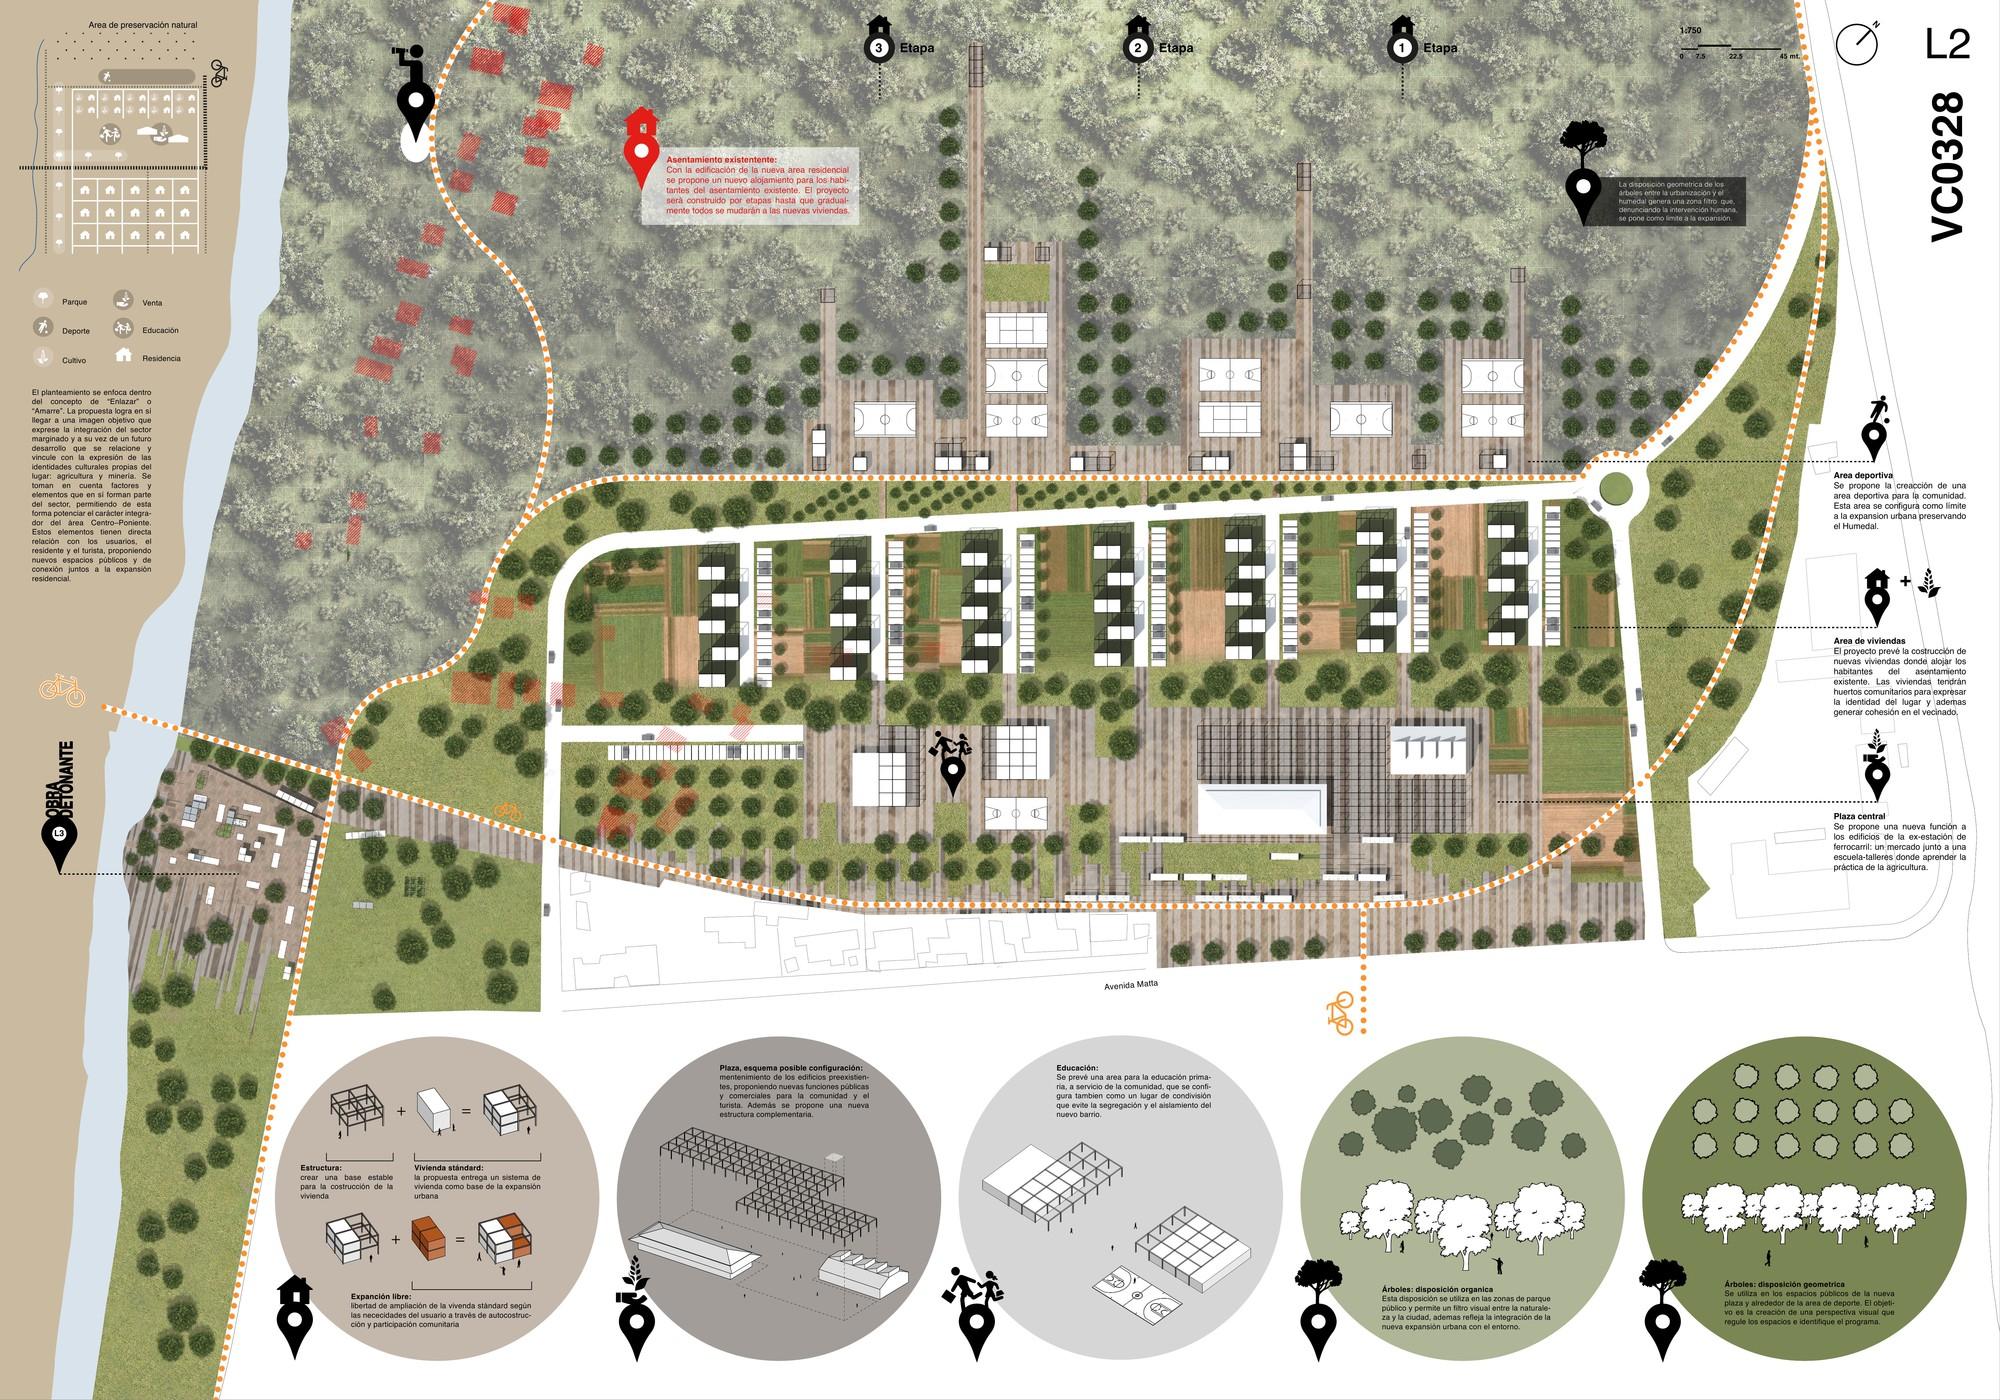 Chile: presentan proyectos ganadores de concurso para estudiantes sobre integración urbana en Vallenar, Primer Lugar: Lámina #02. Image Cortesia de TECHO - Chile